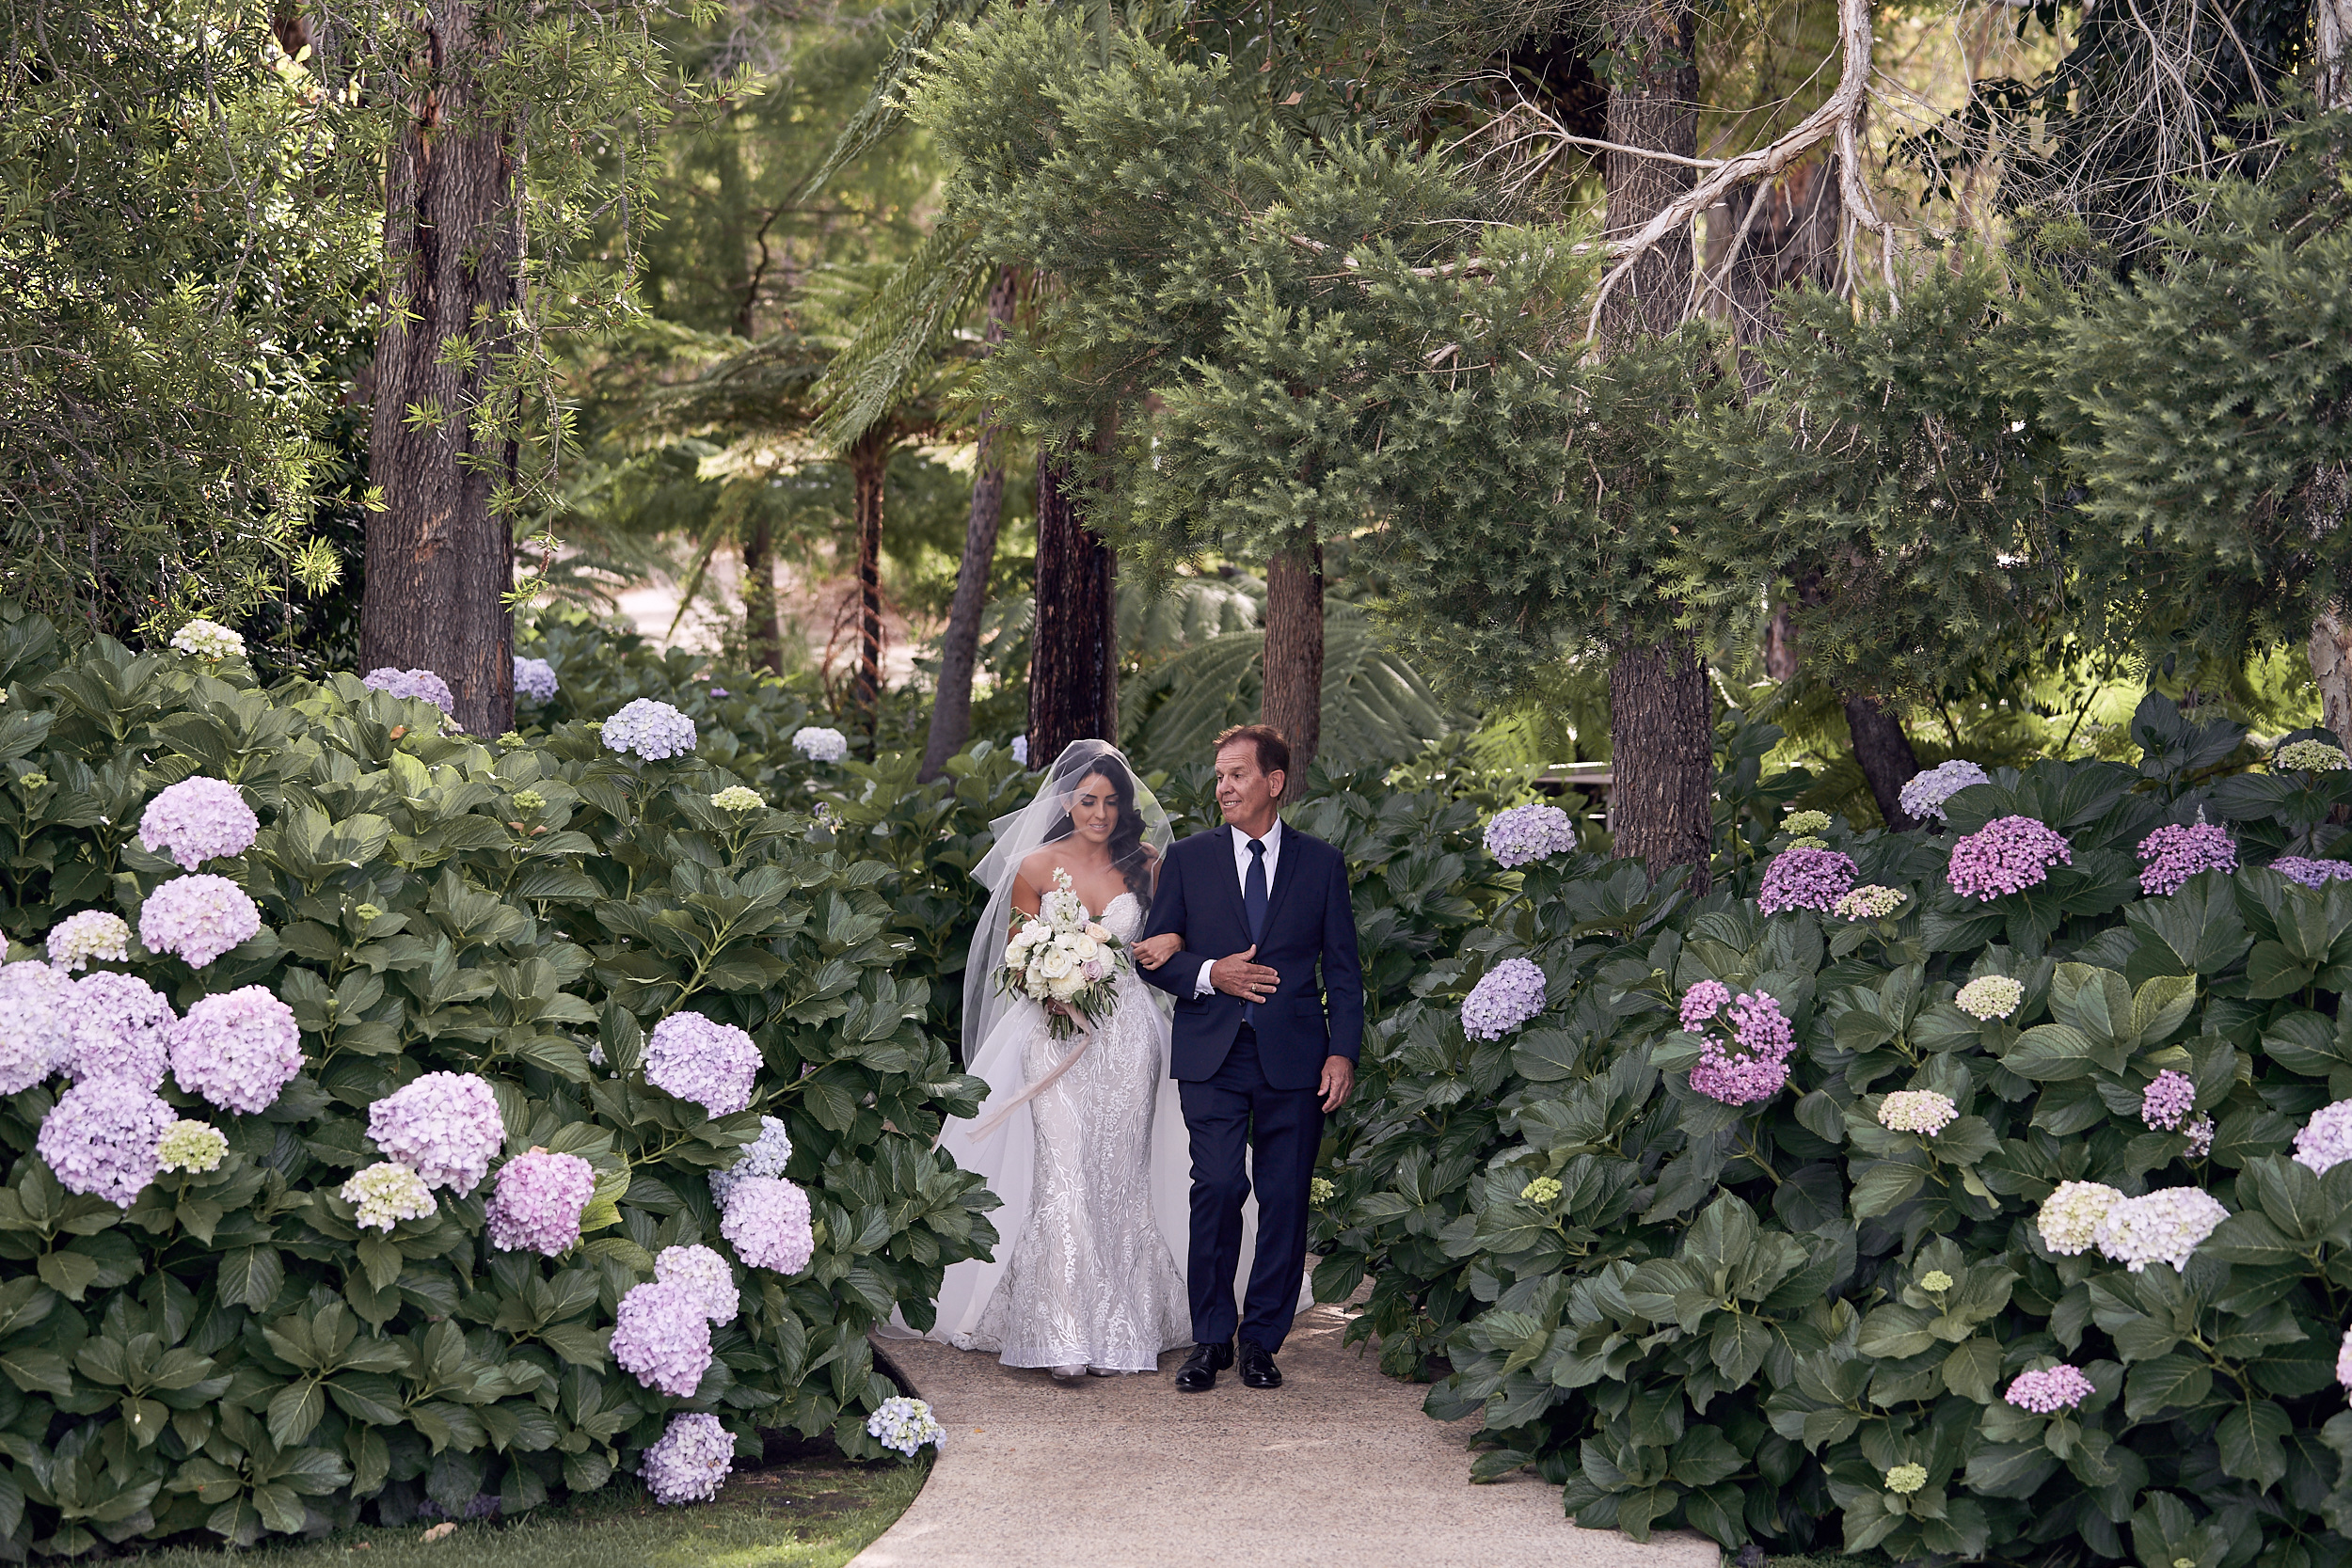 LR_JandA-aravina-wedding-LostInLove 437.jpg